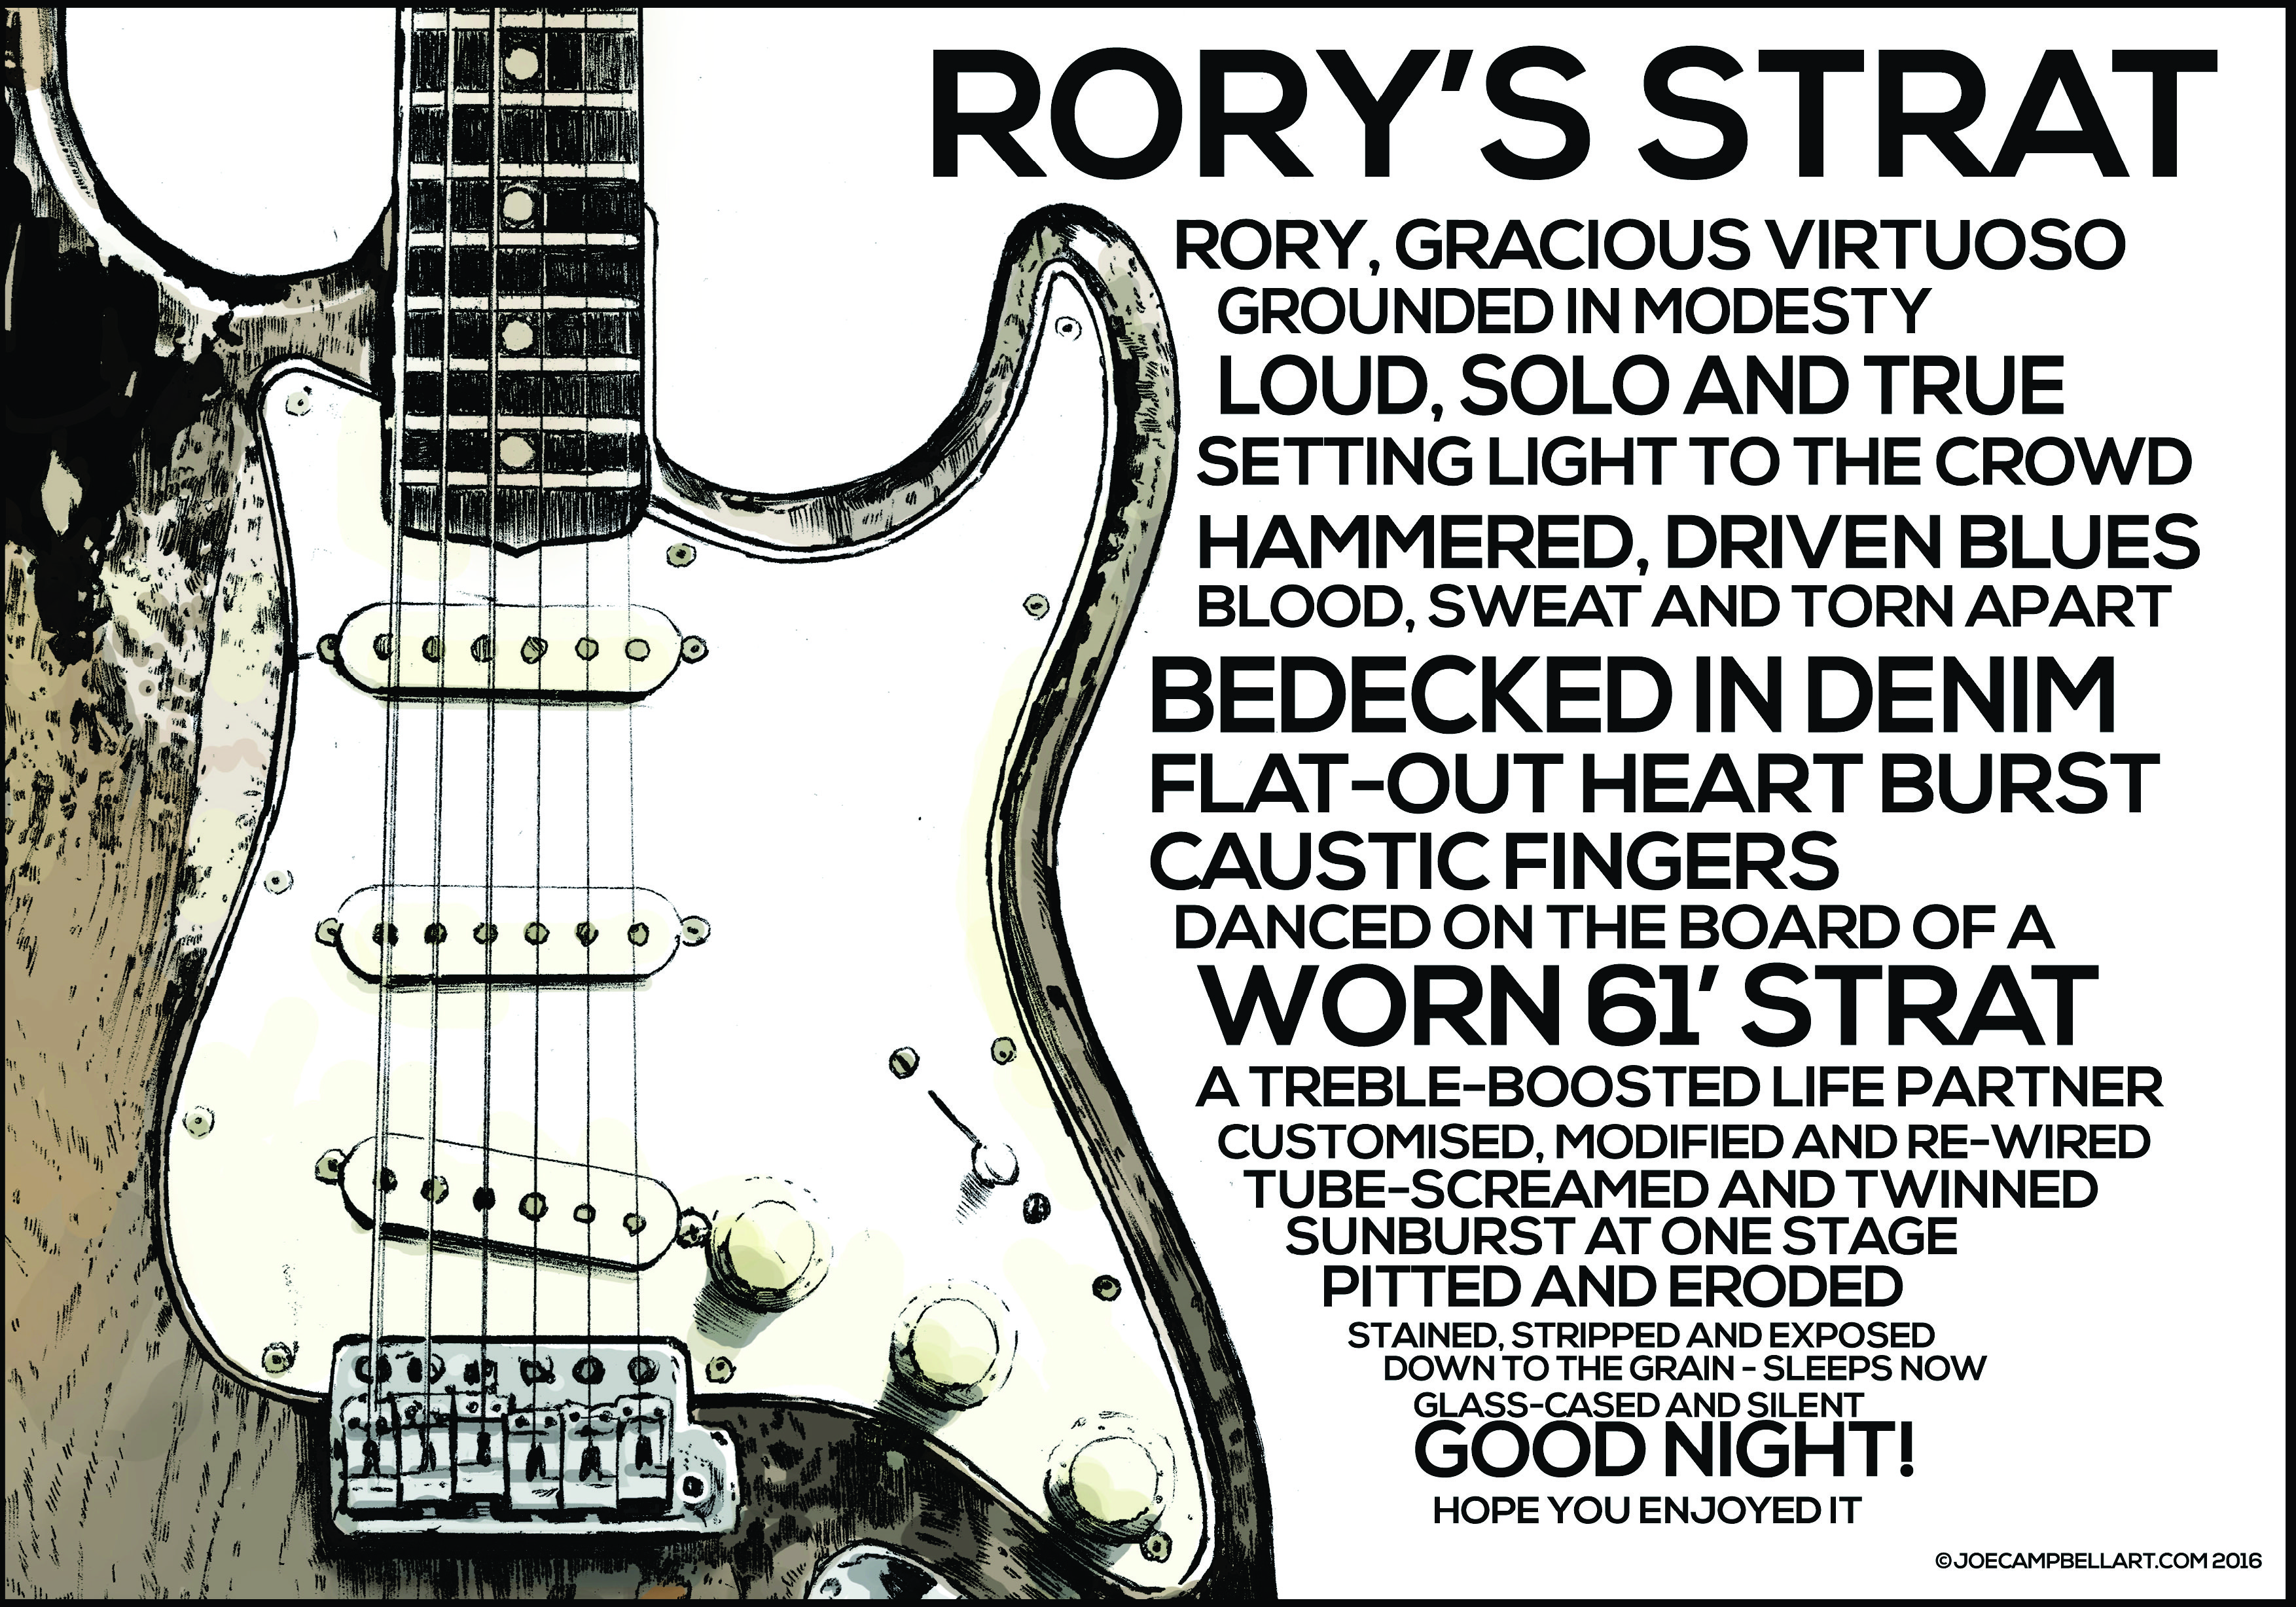 RORY'S STRAT